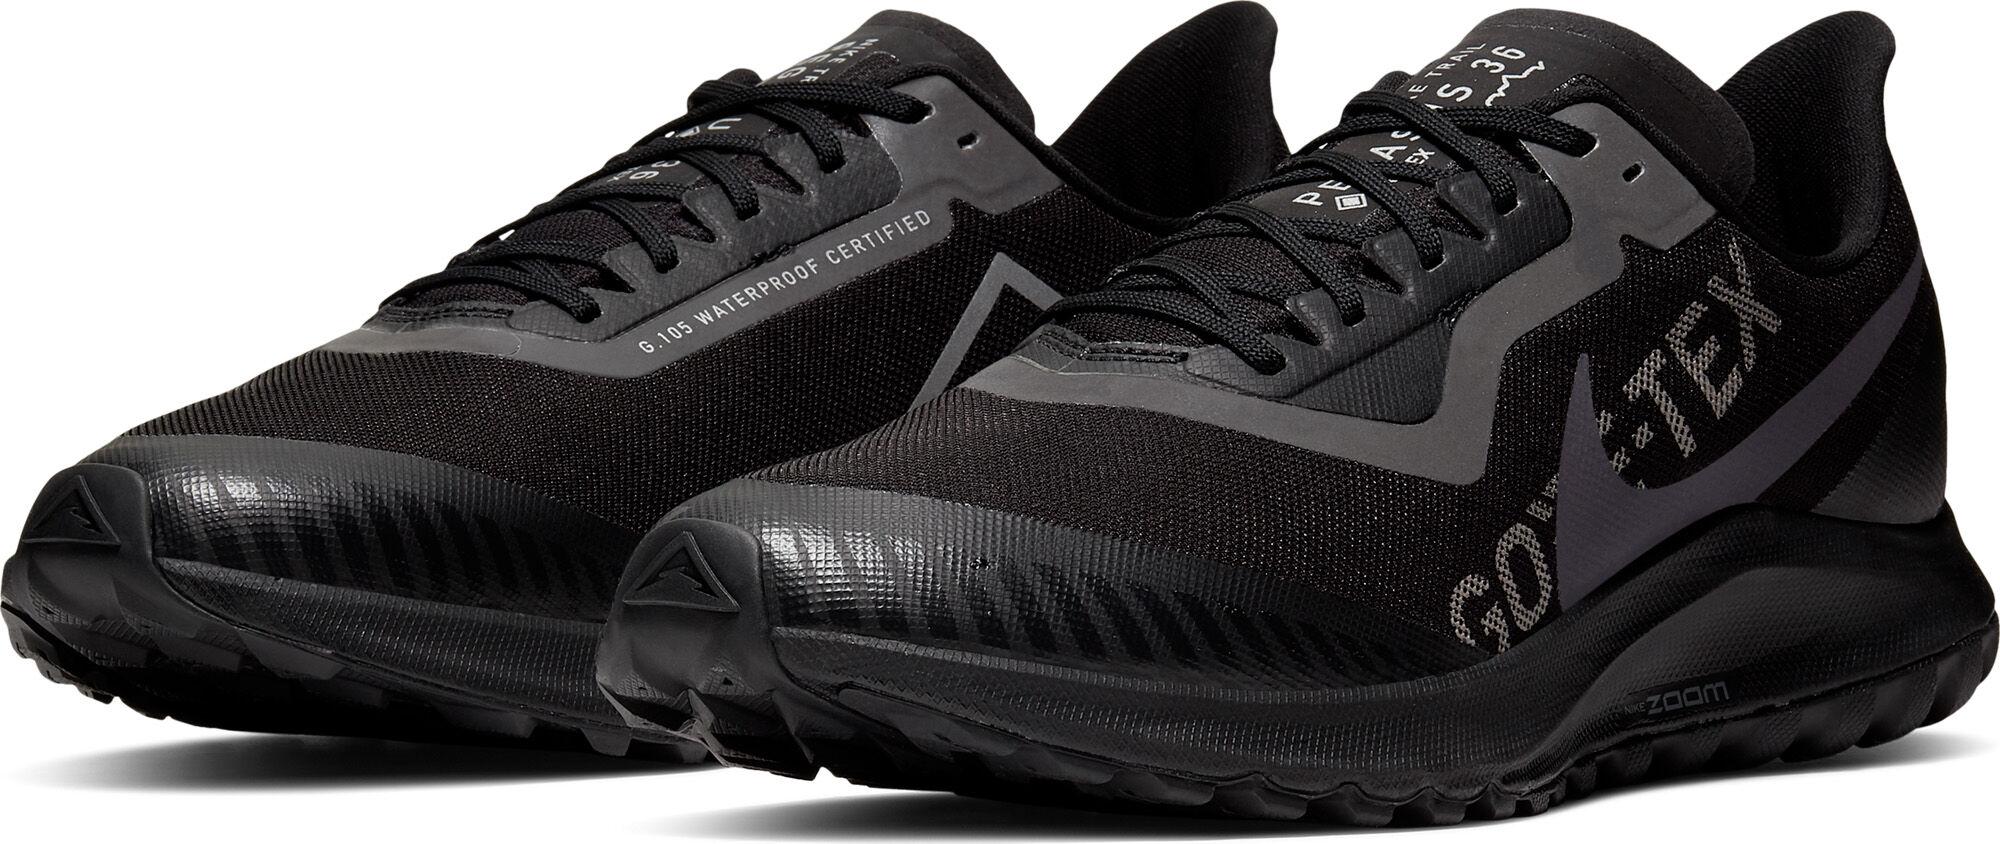 Nike · Zoom Pegasus 36 Trail GTX férfi terepfutó cipő Férfiak